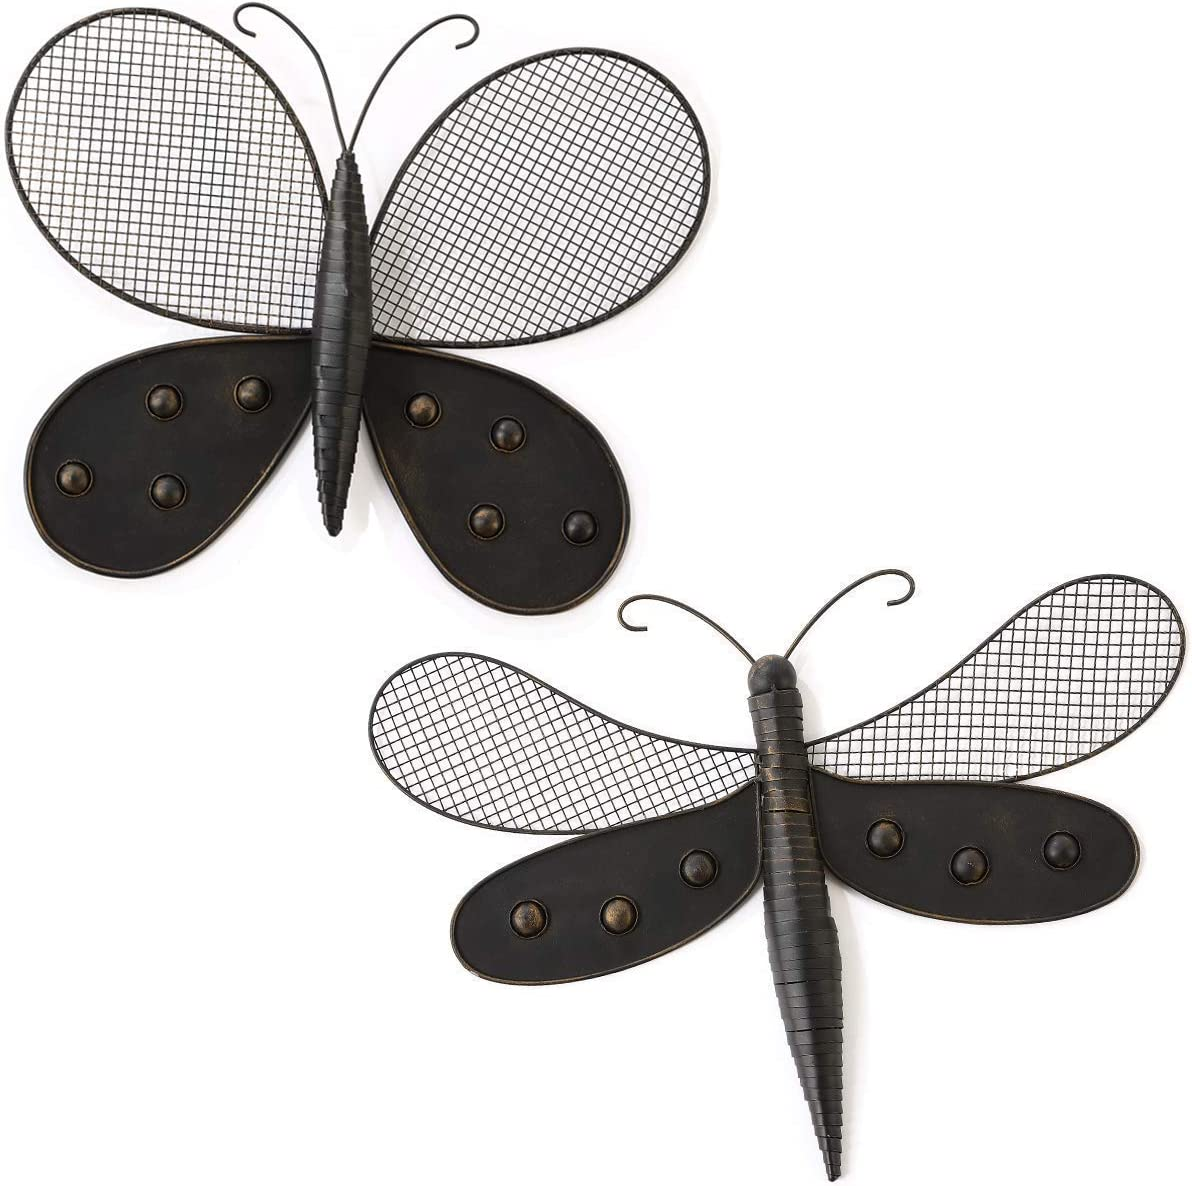 Lechesis Dragonfly and Butterfly Metal Wall Art Decor Sculptures Indoor Outdoor(Set of 2), Bronze